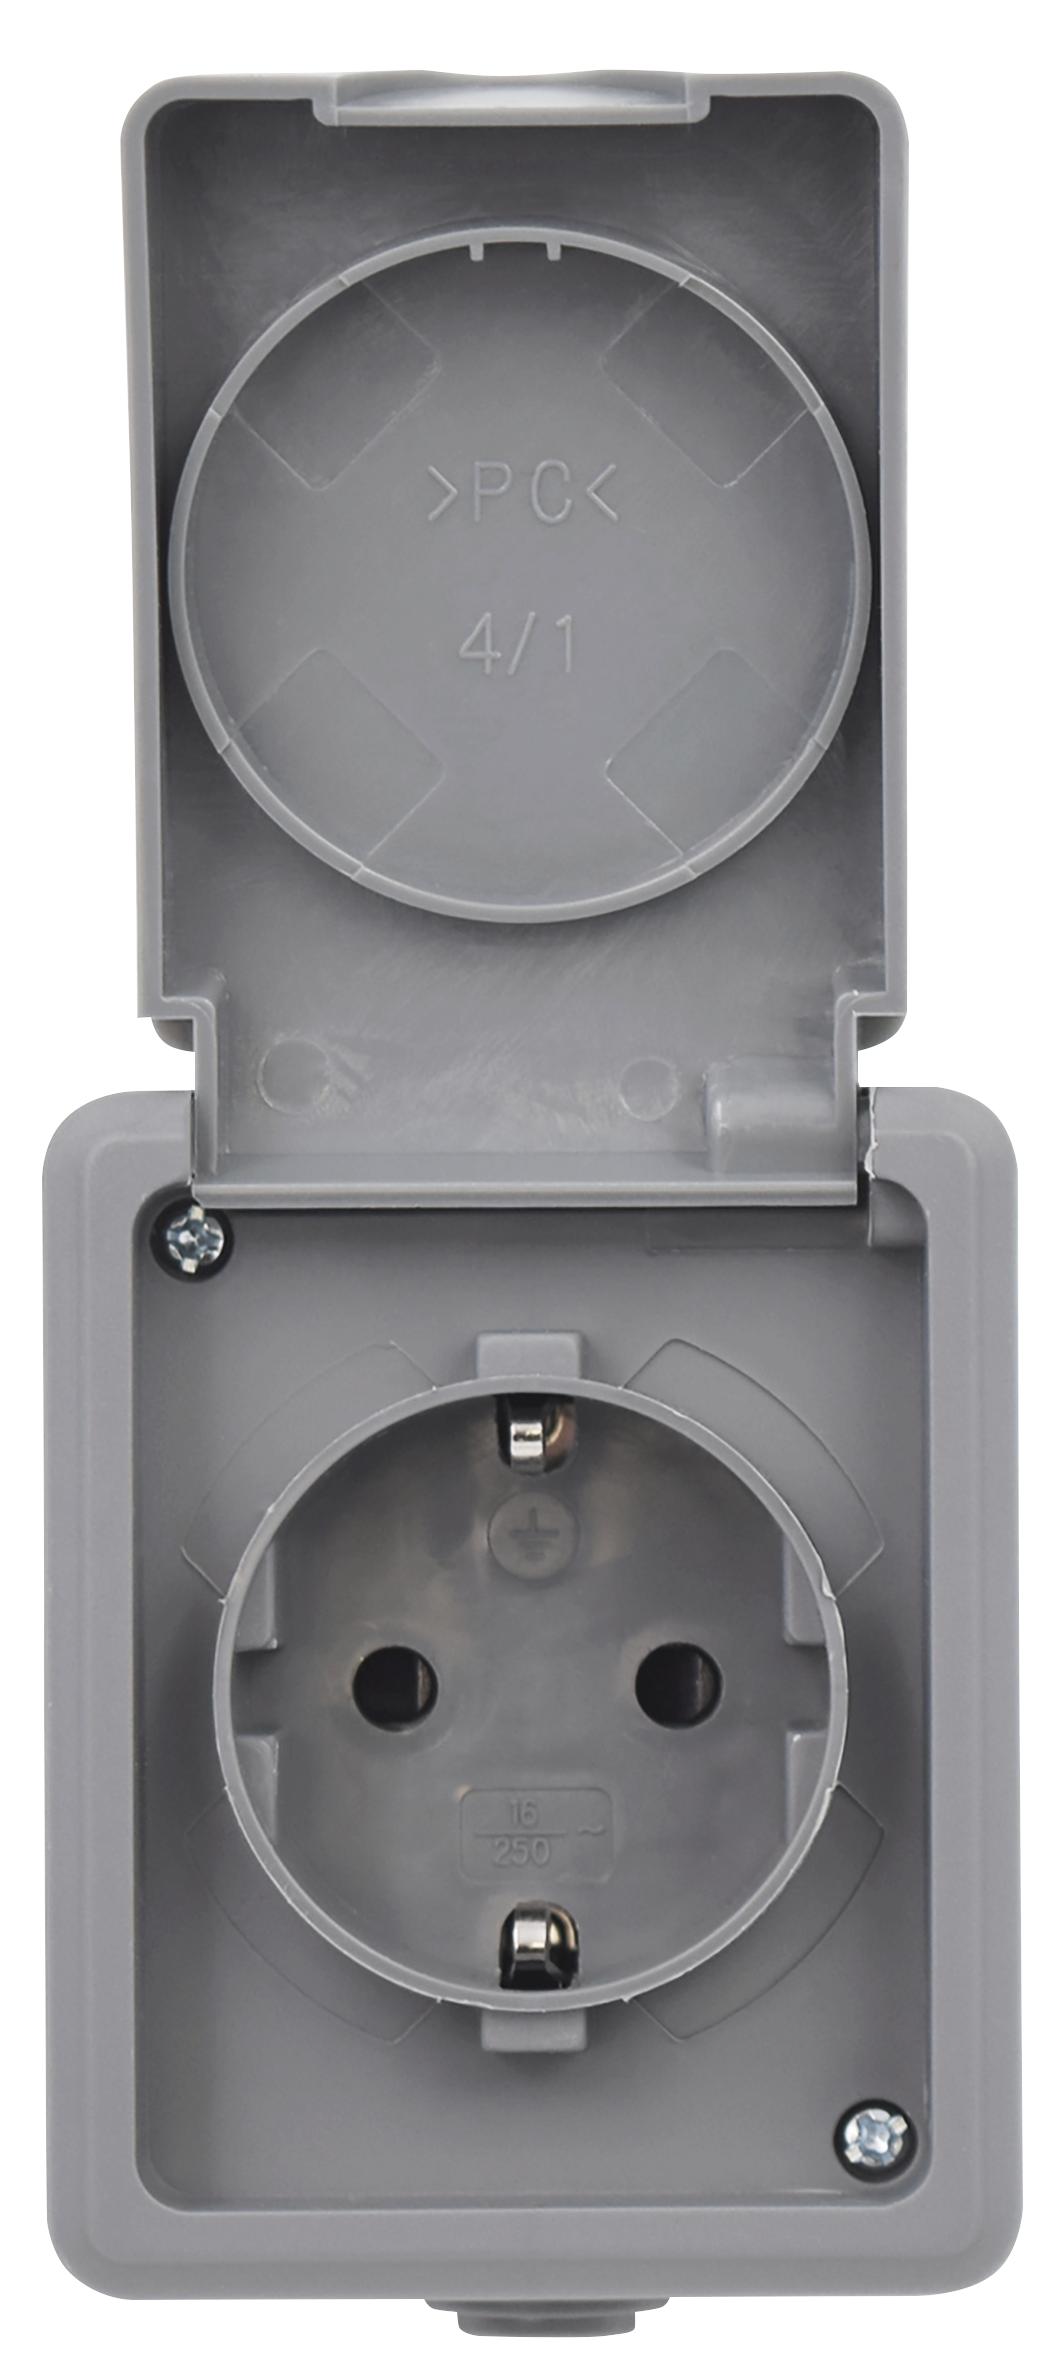 Feuchtraum Steckdose McPower ''Secure'', 250V~/16A, IP44, AP, grau